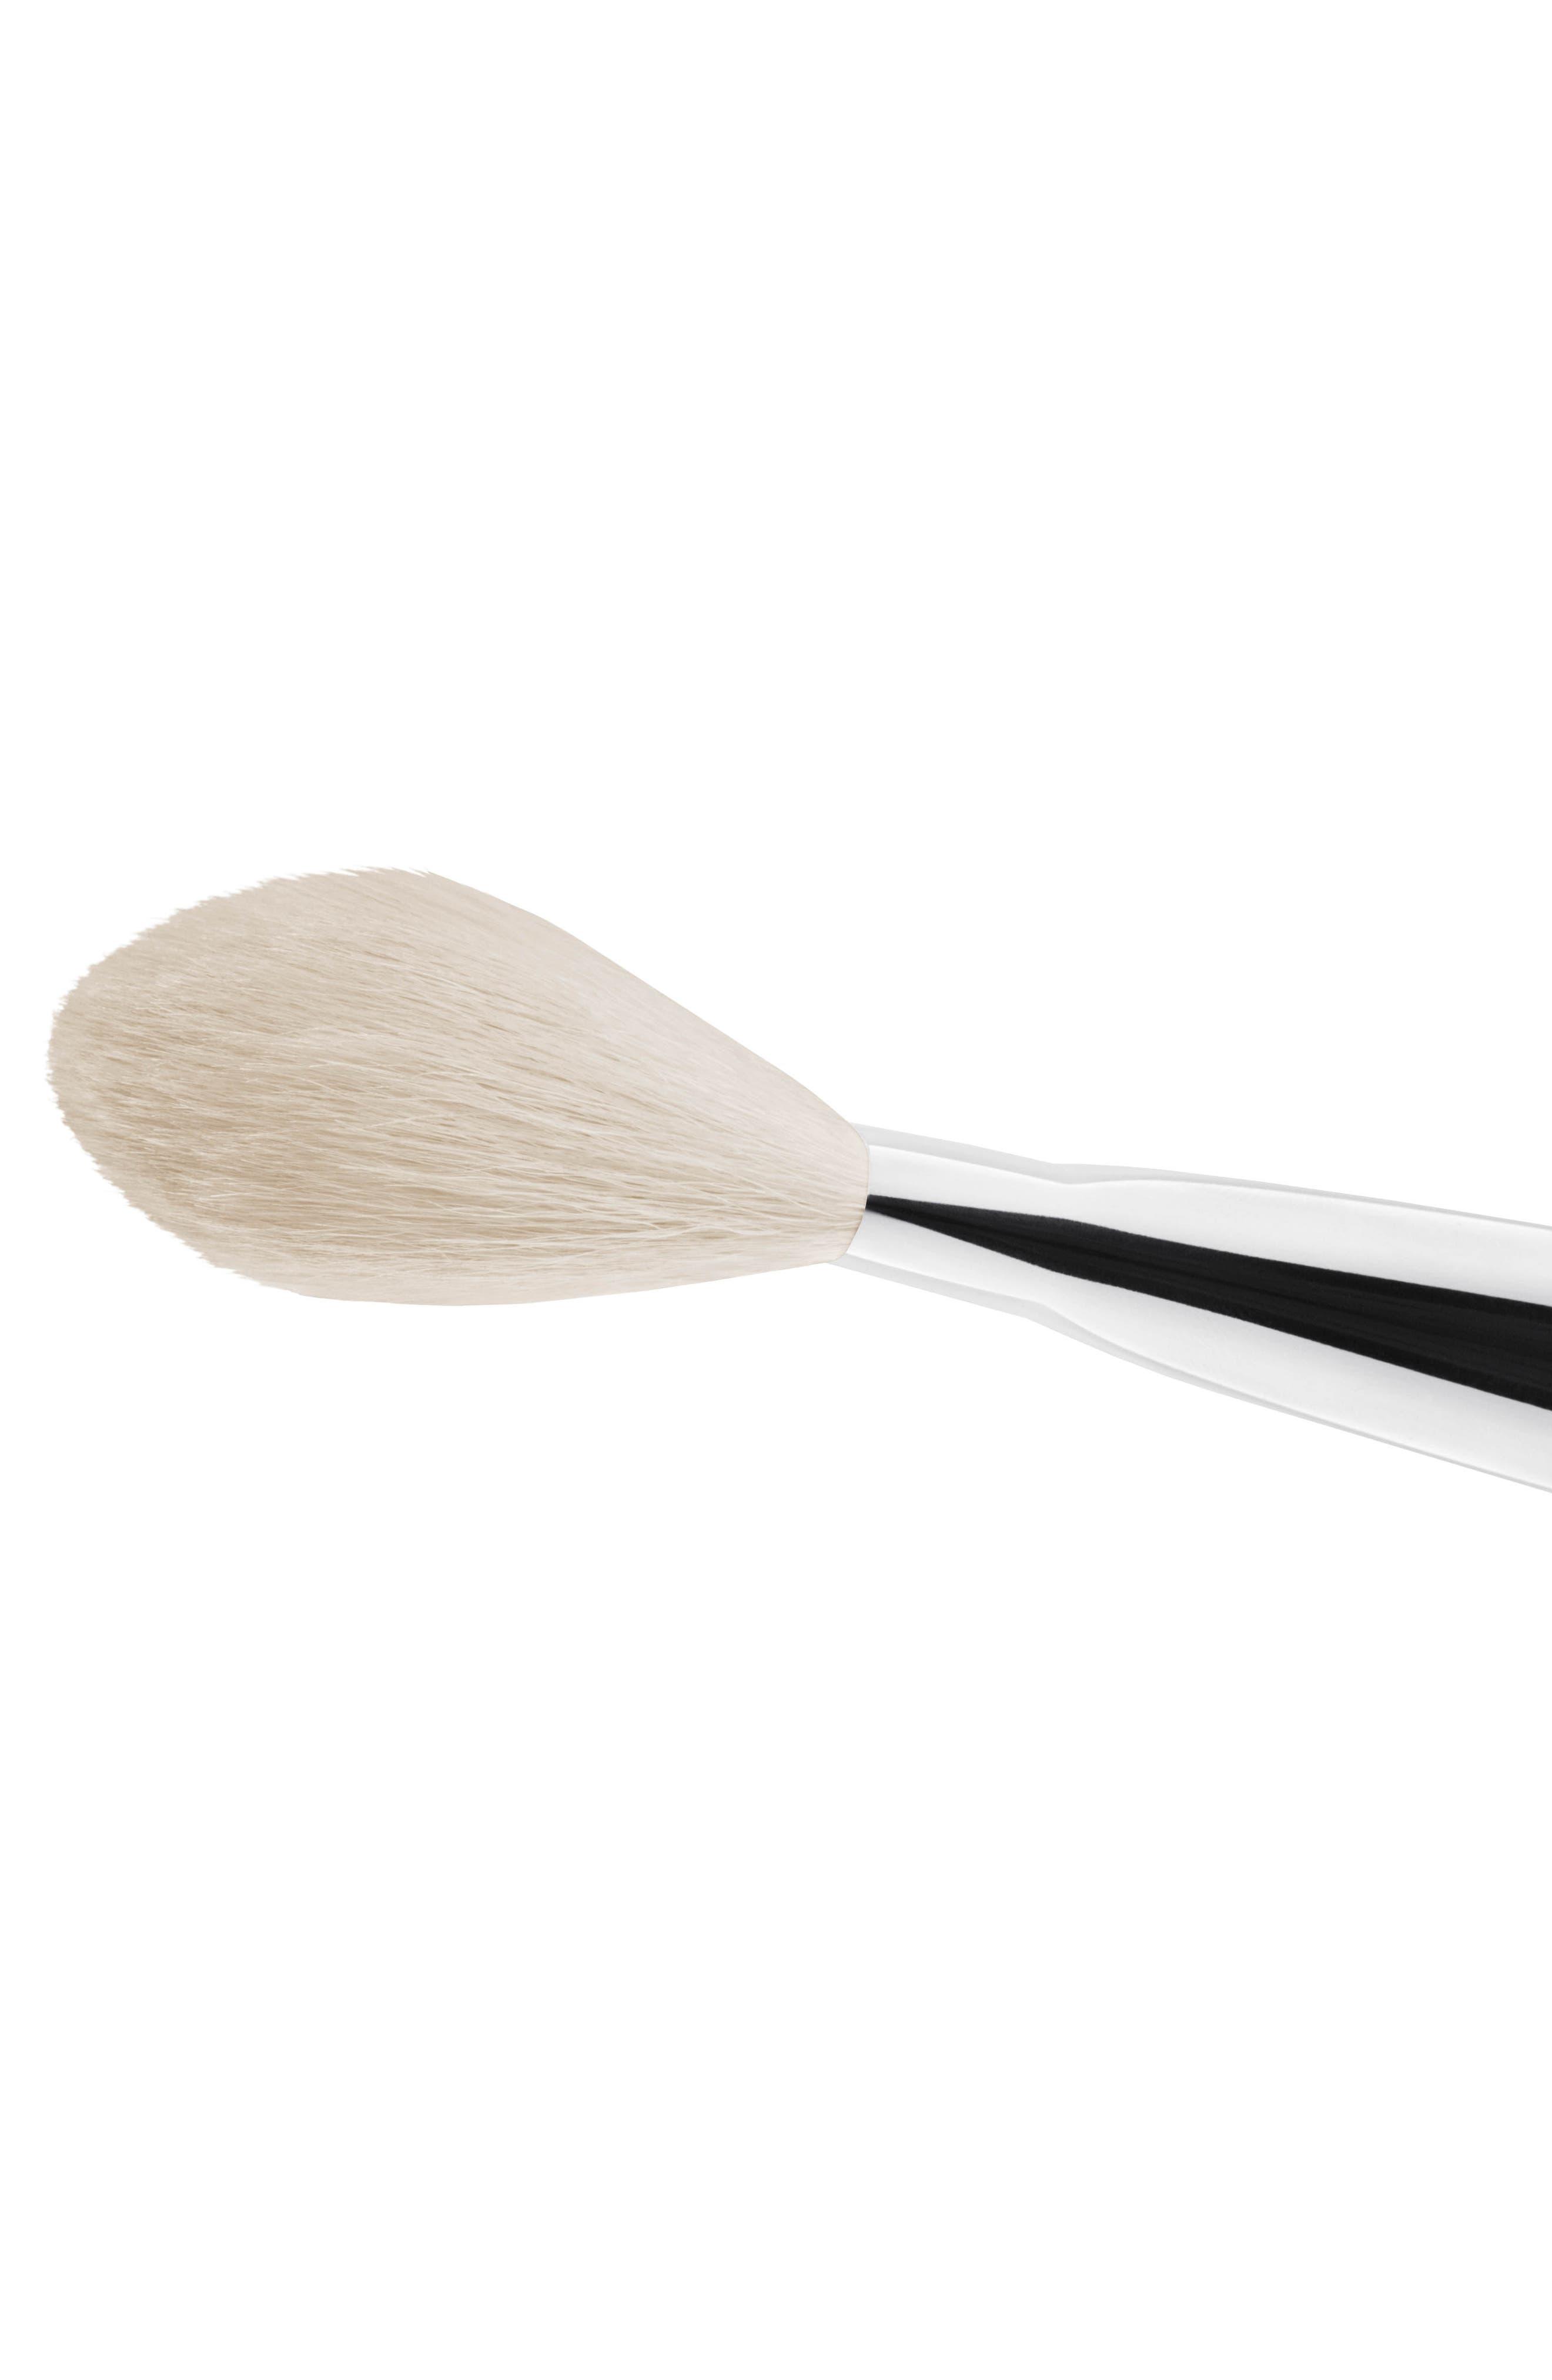 MAC 135S Synthetic Large Flat Powder Brush,                             Alternate thumbnail 2, color,                             NO COLOR